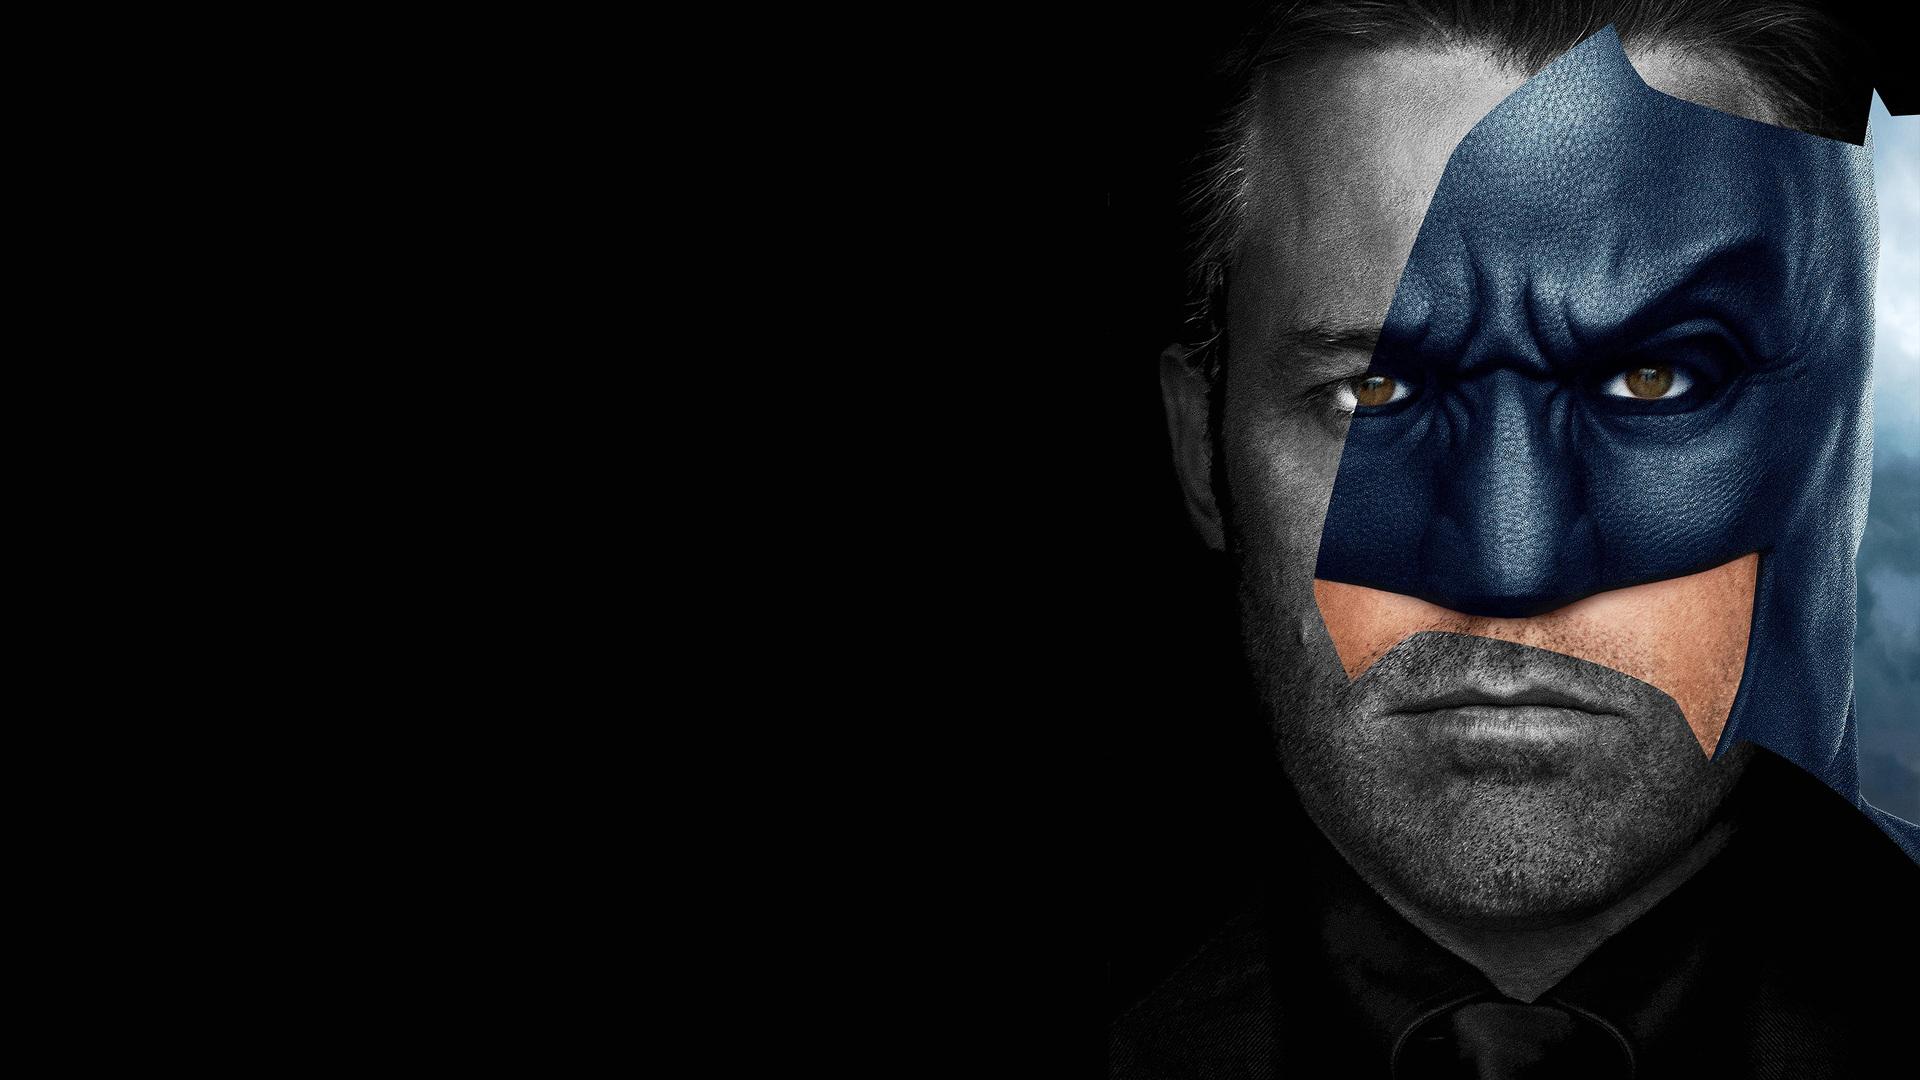 Justice League 2017 Movie 4k Hd Desktop Wallpaper For 4k: 1920x1080 4K Batman Justice League 2017 Laptop Full HD